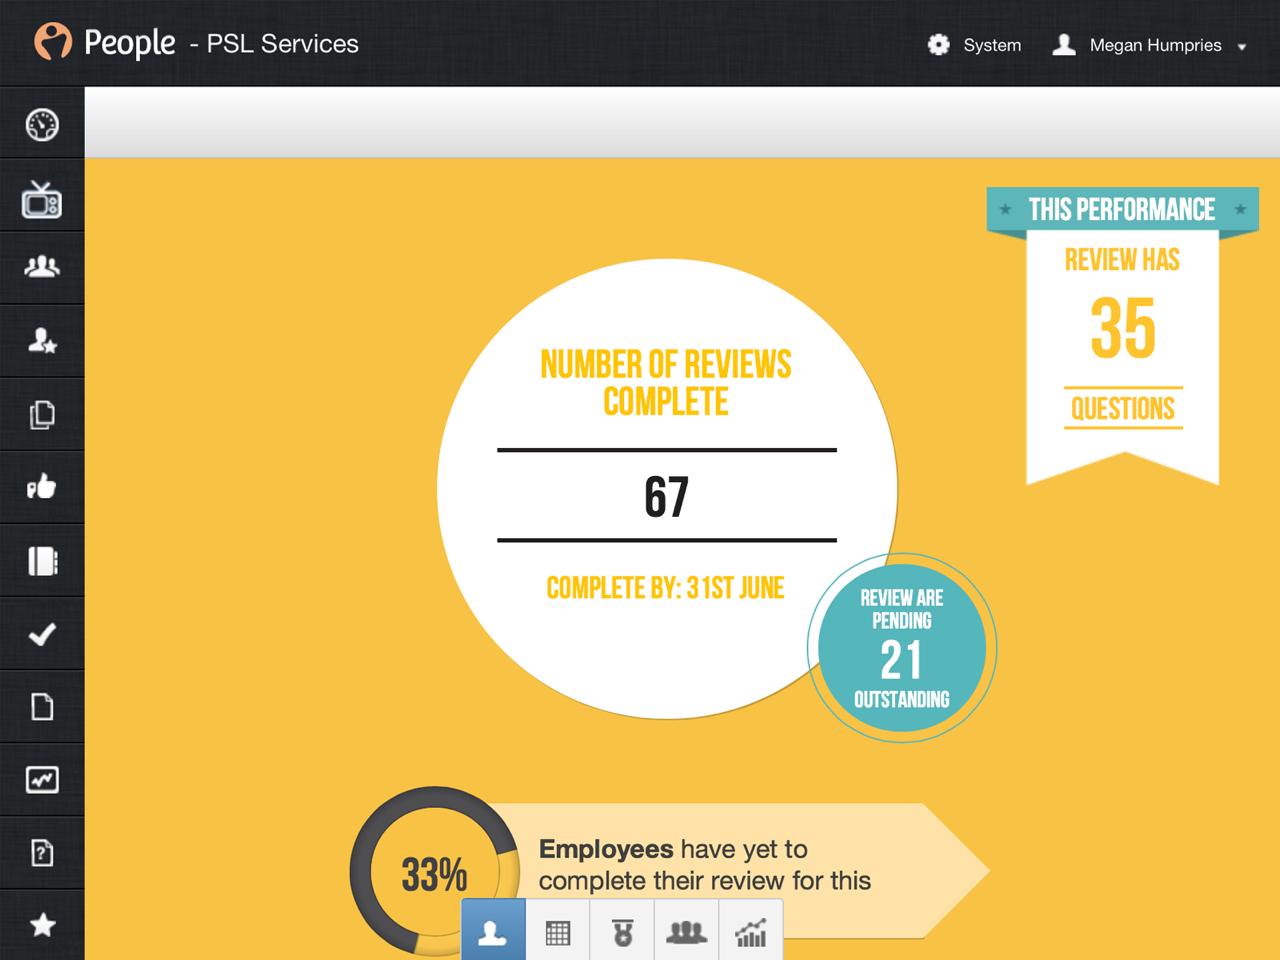 PeopleHR Software - Build progress reports